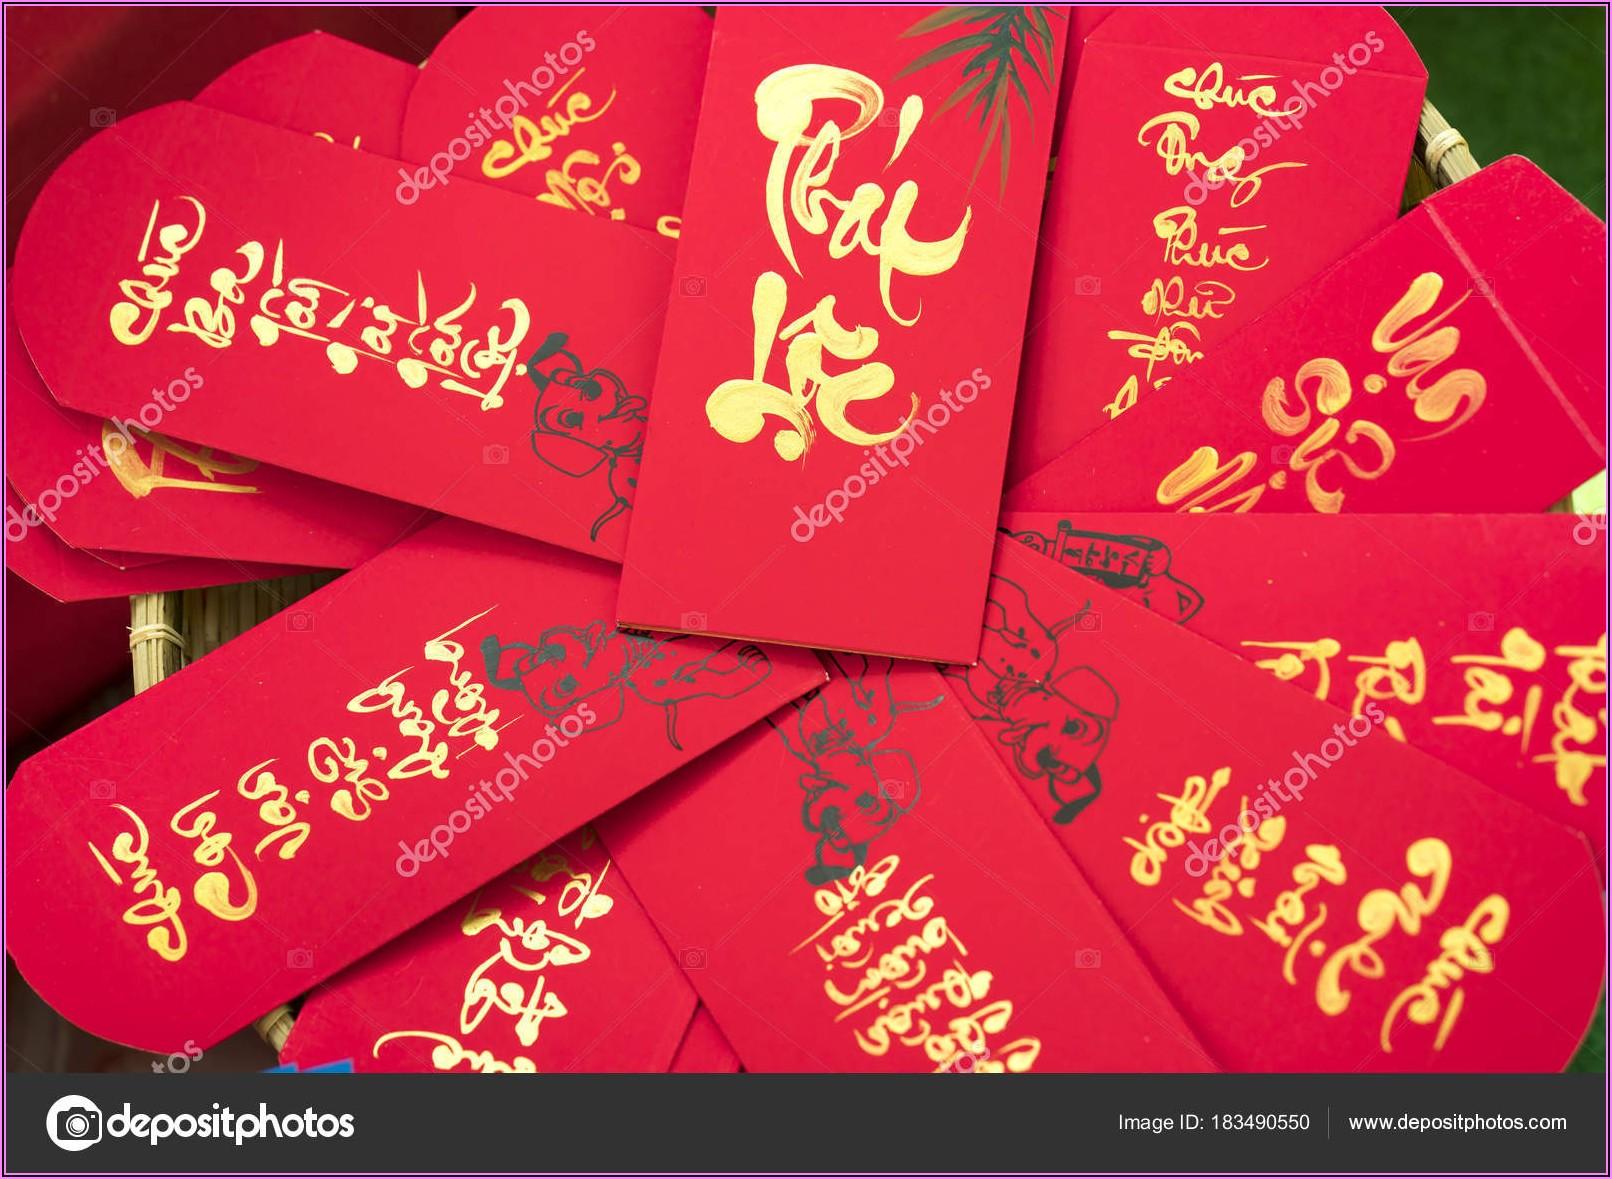 Lunar New Year Red Envelopes